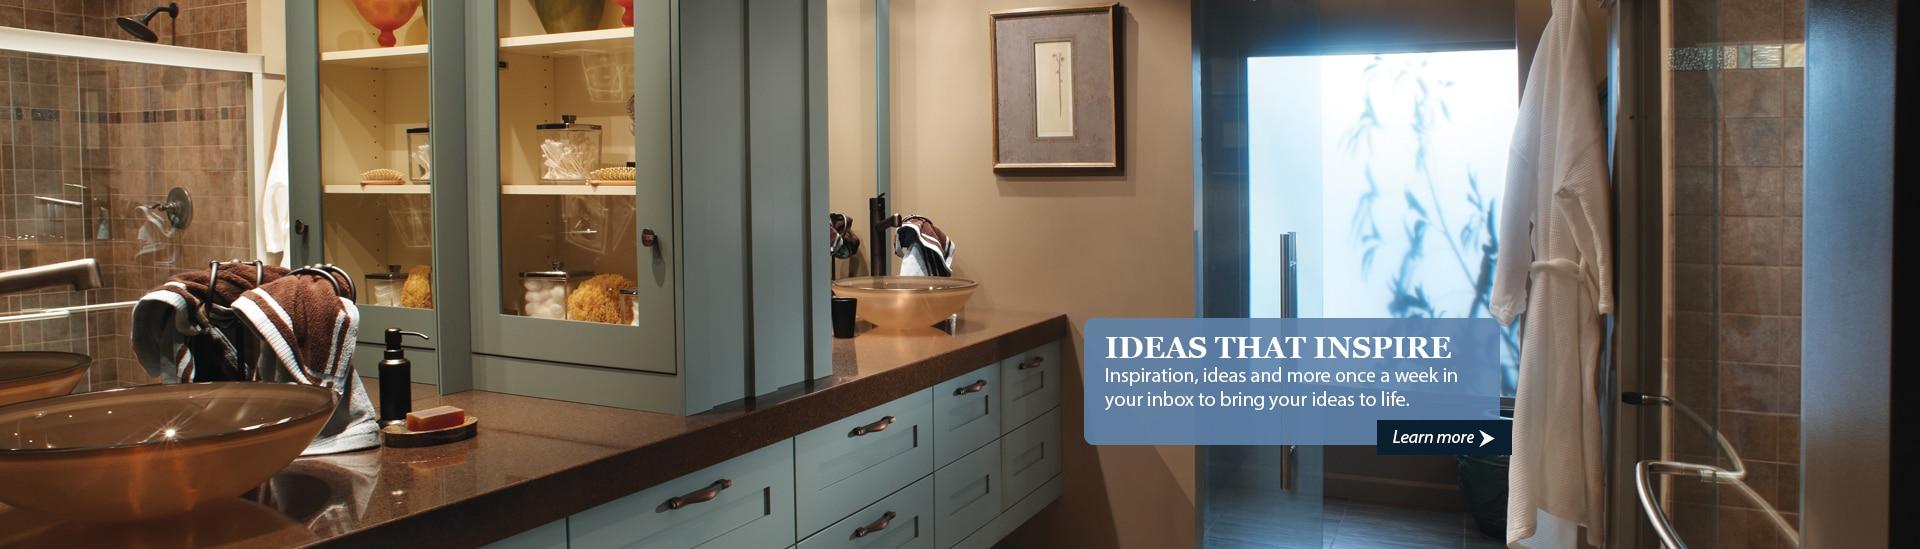 Kitchen Bathroom Home Remodeling Cincinnati Neal 39 S Design Remodel